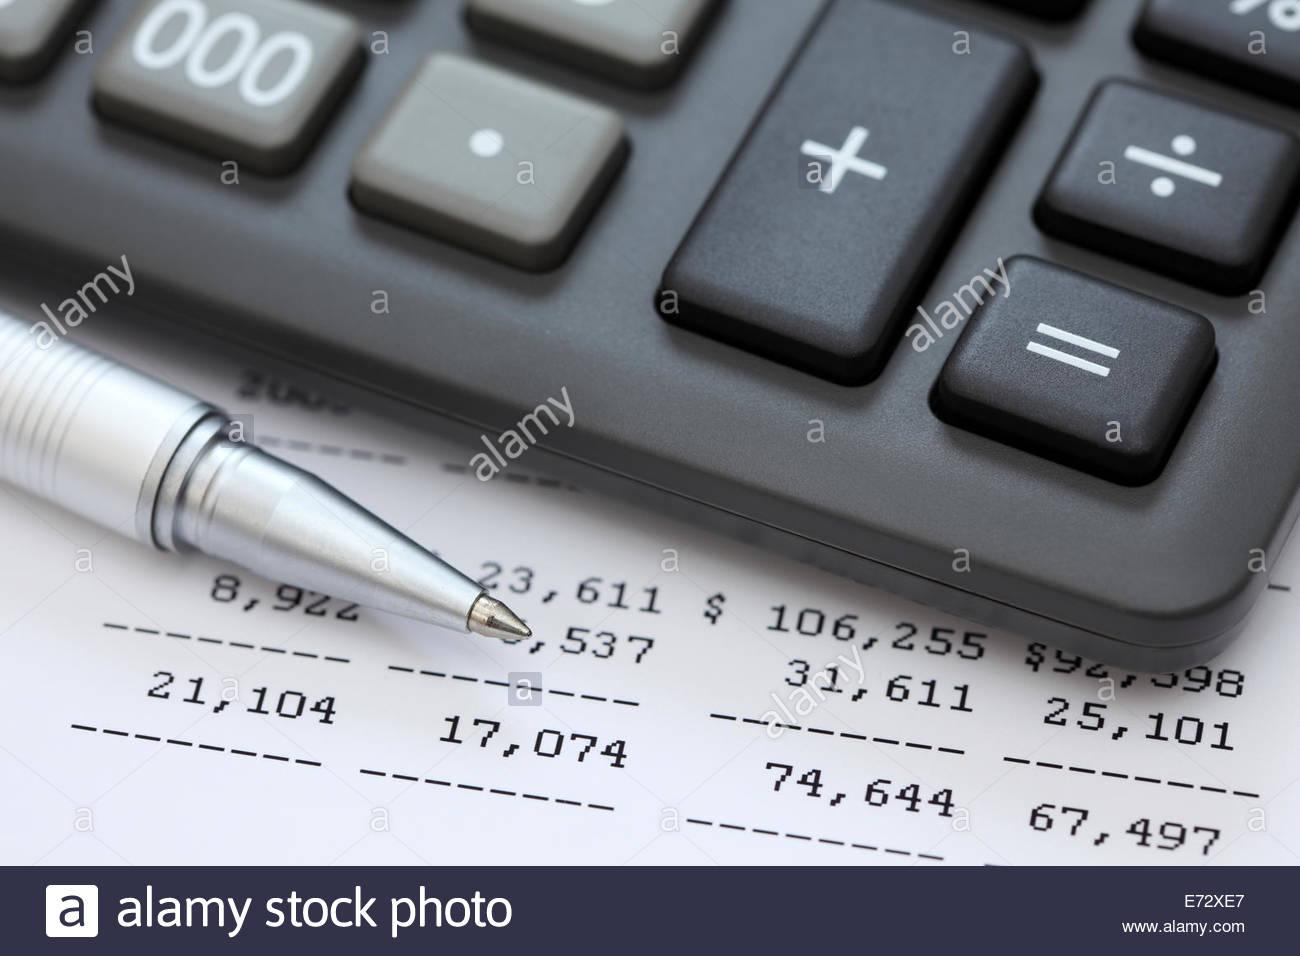 Closing Procedures & Financial Statements 6/3